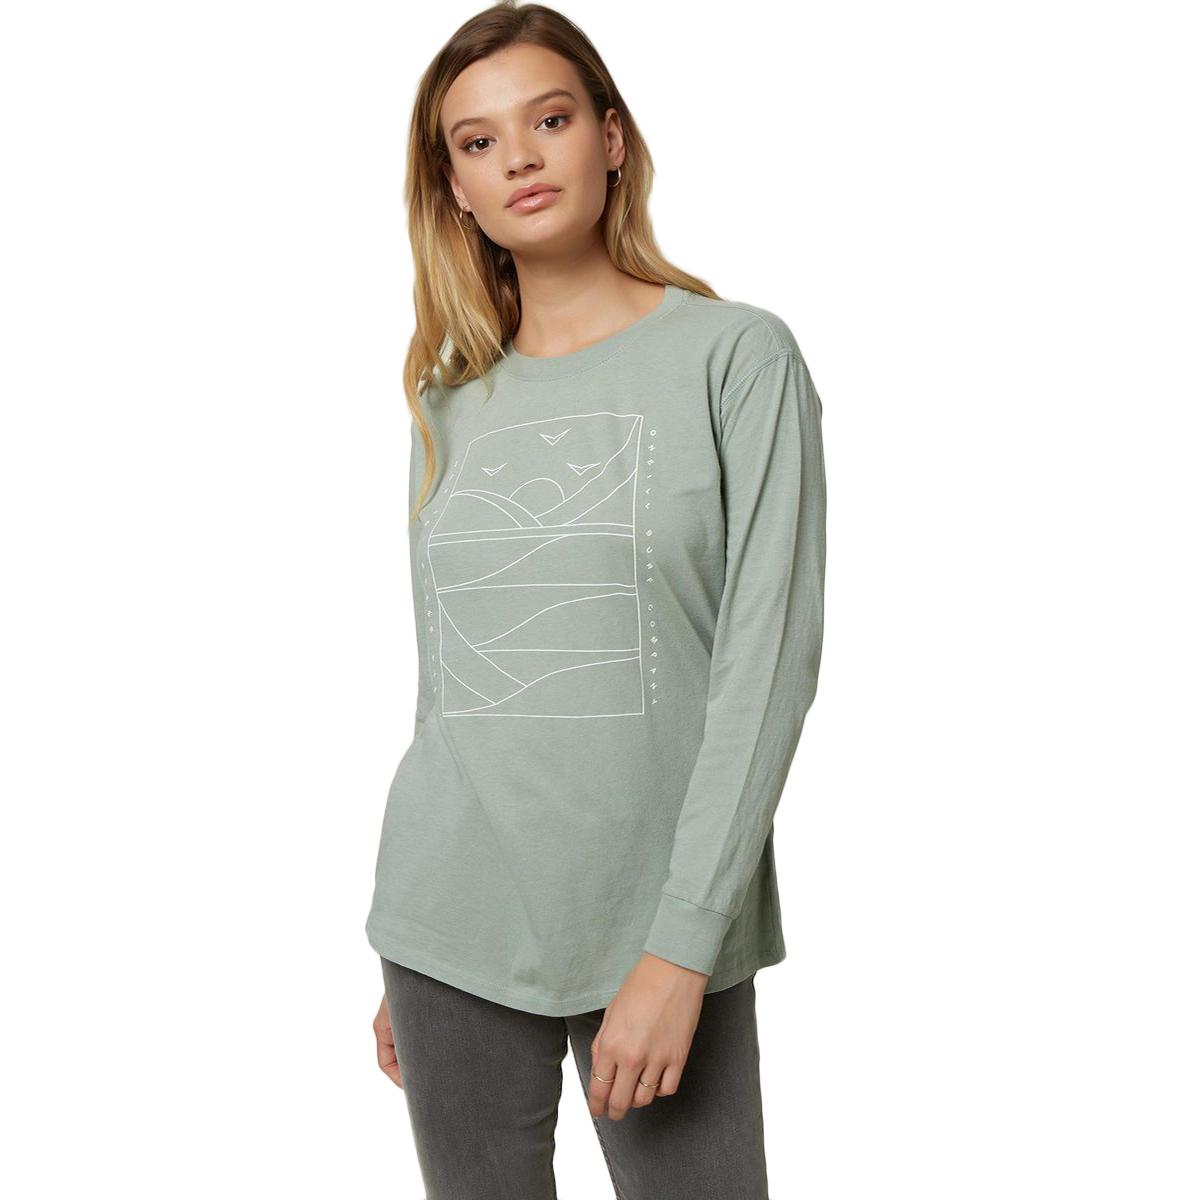 O'neill Women's Modern Coast Long-Sleeve Tee - Green, XS